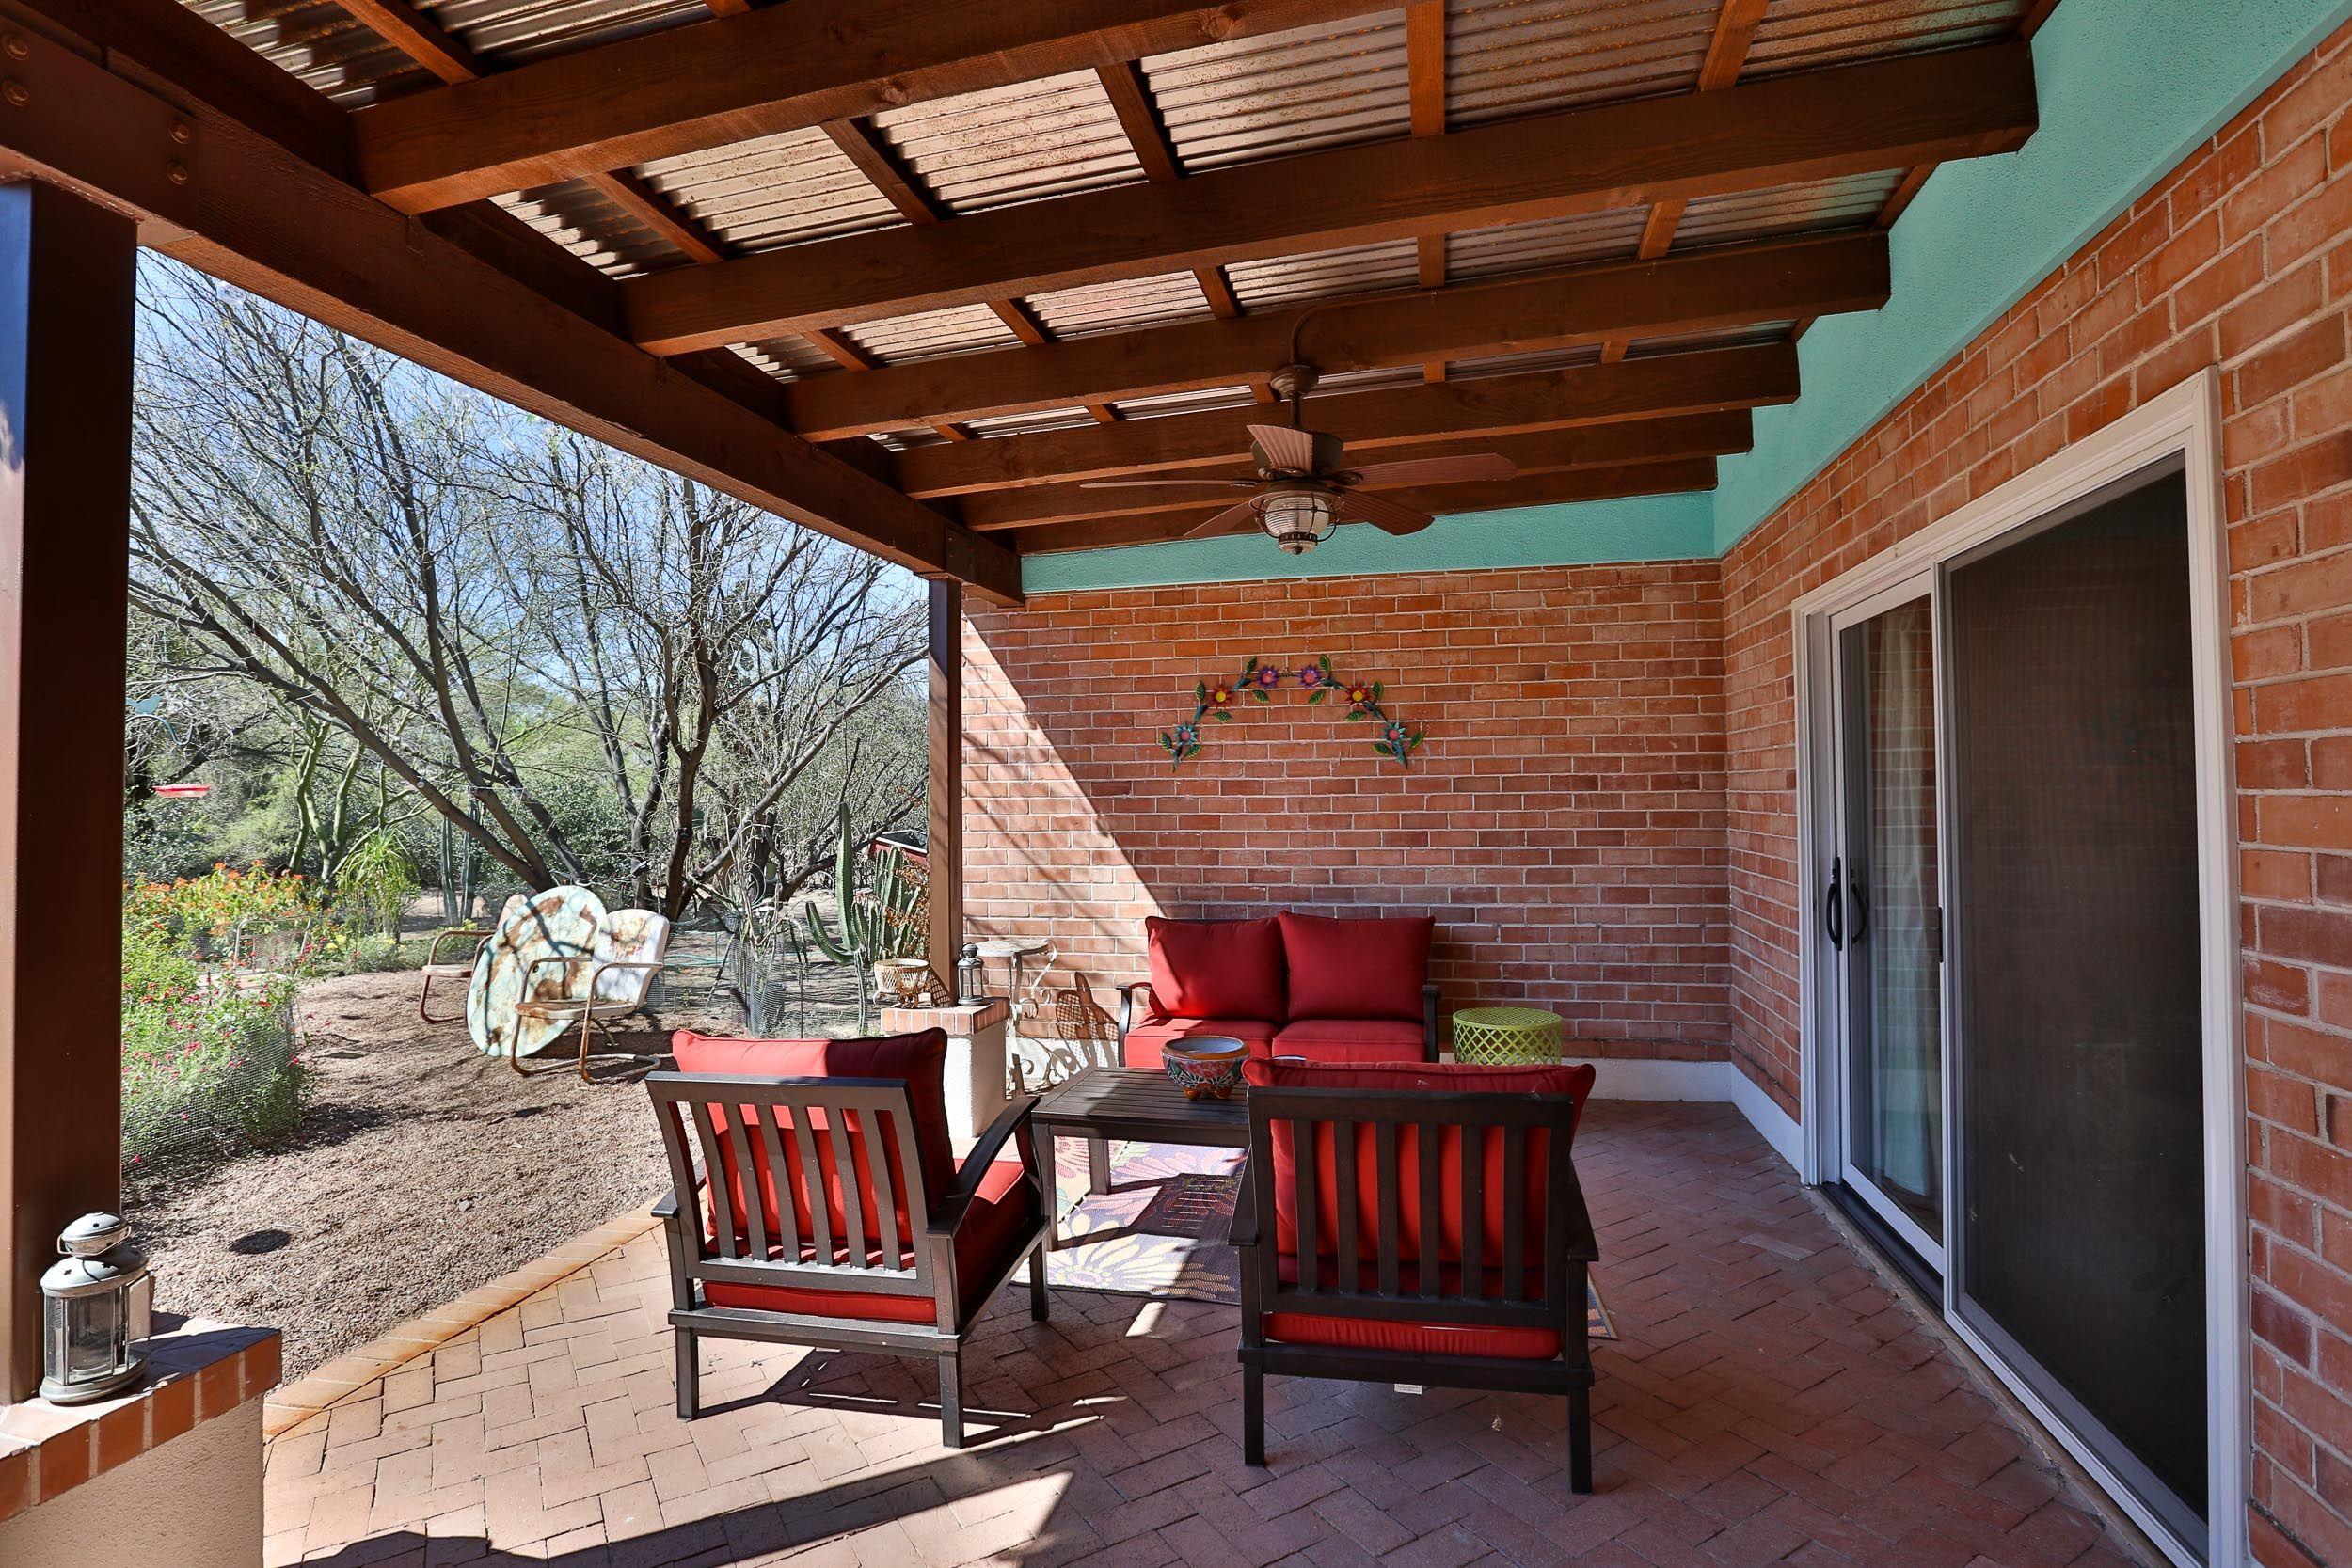 Tucson, Arizona Architect Contractor, Design Build. Outdoor Patio.  Corrugated Metal Roof,